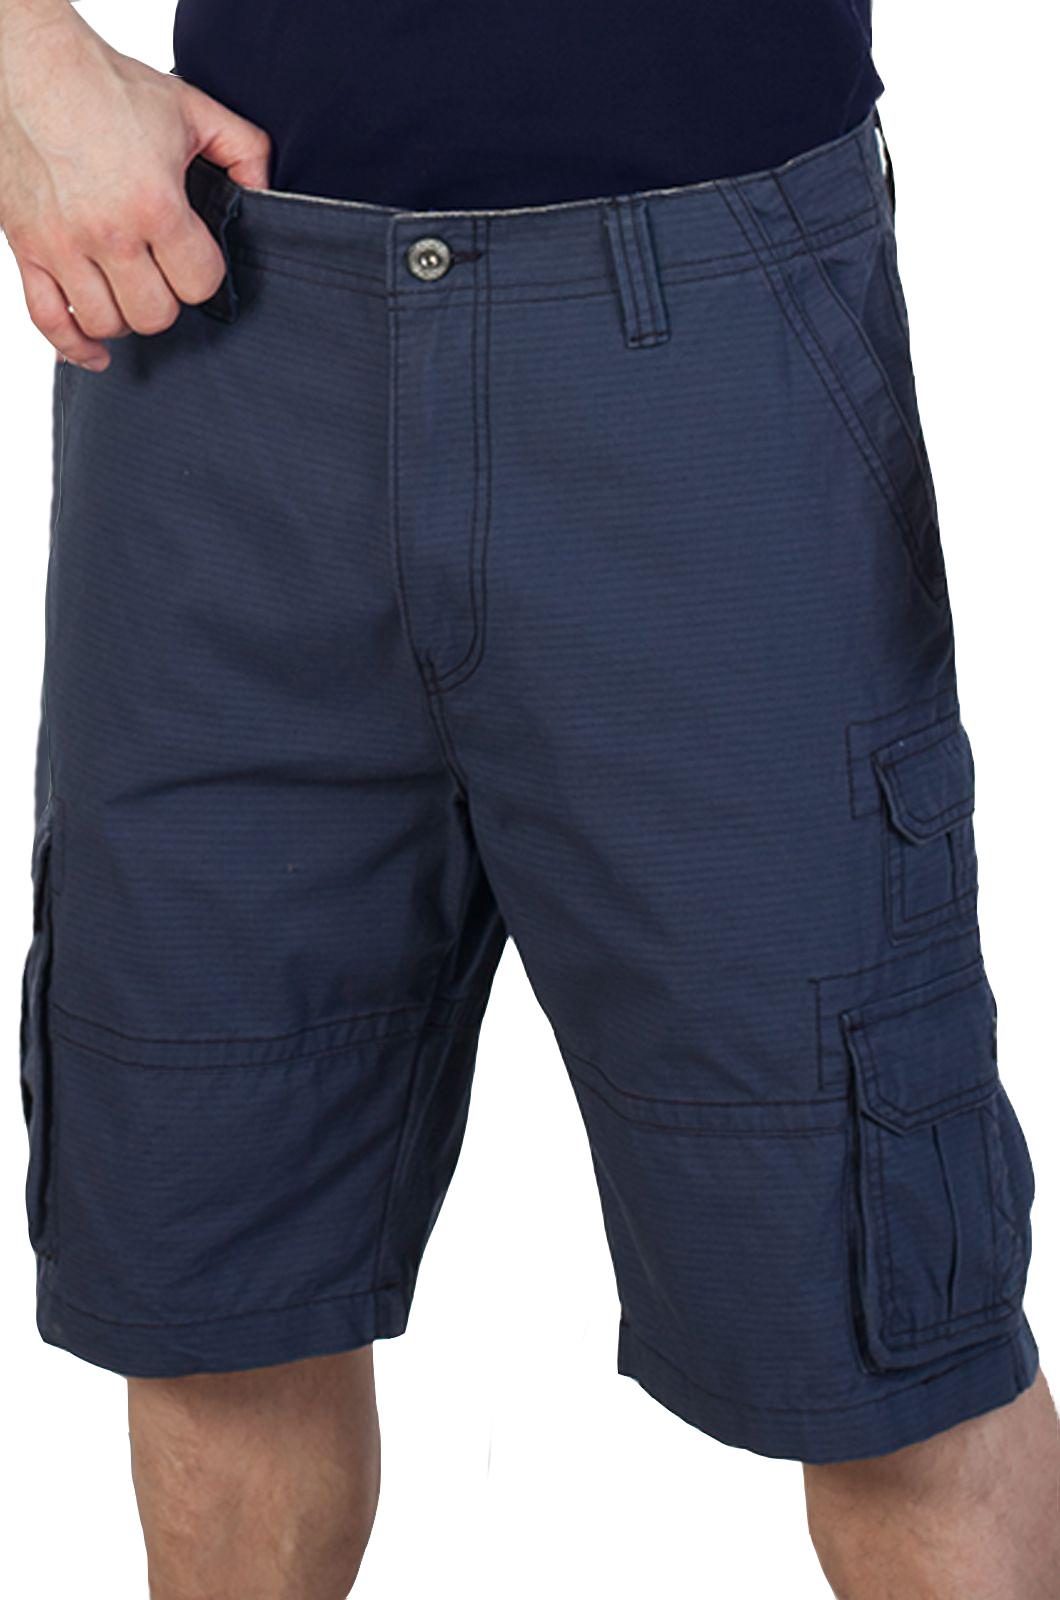 Мужские шорты от бренда IRON CO